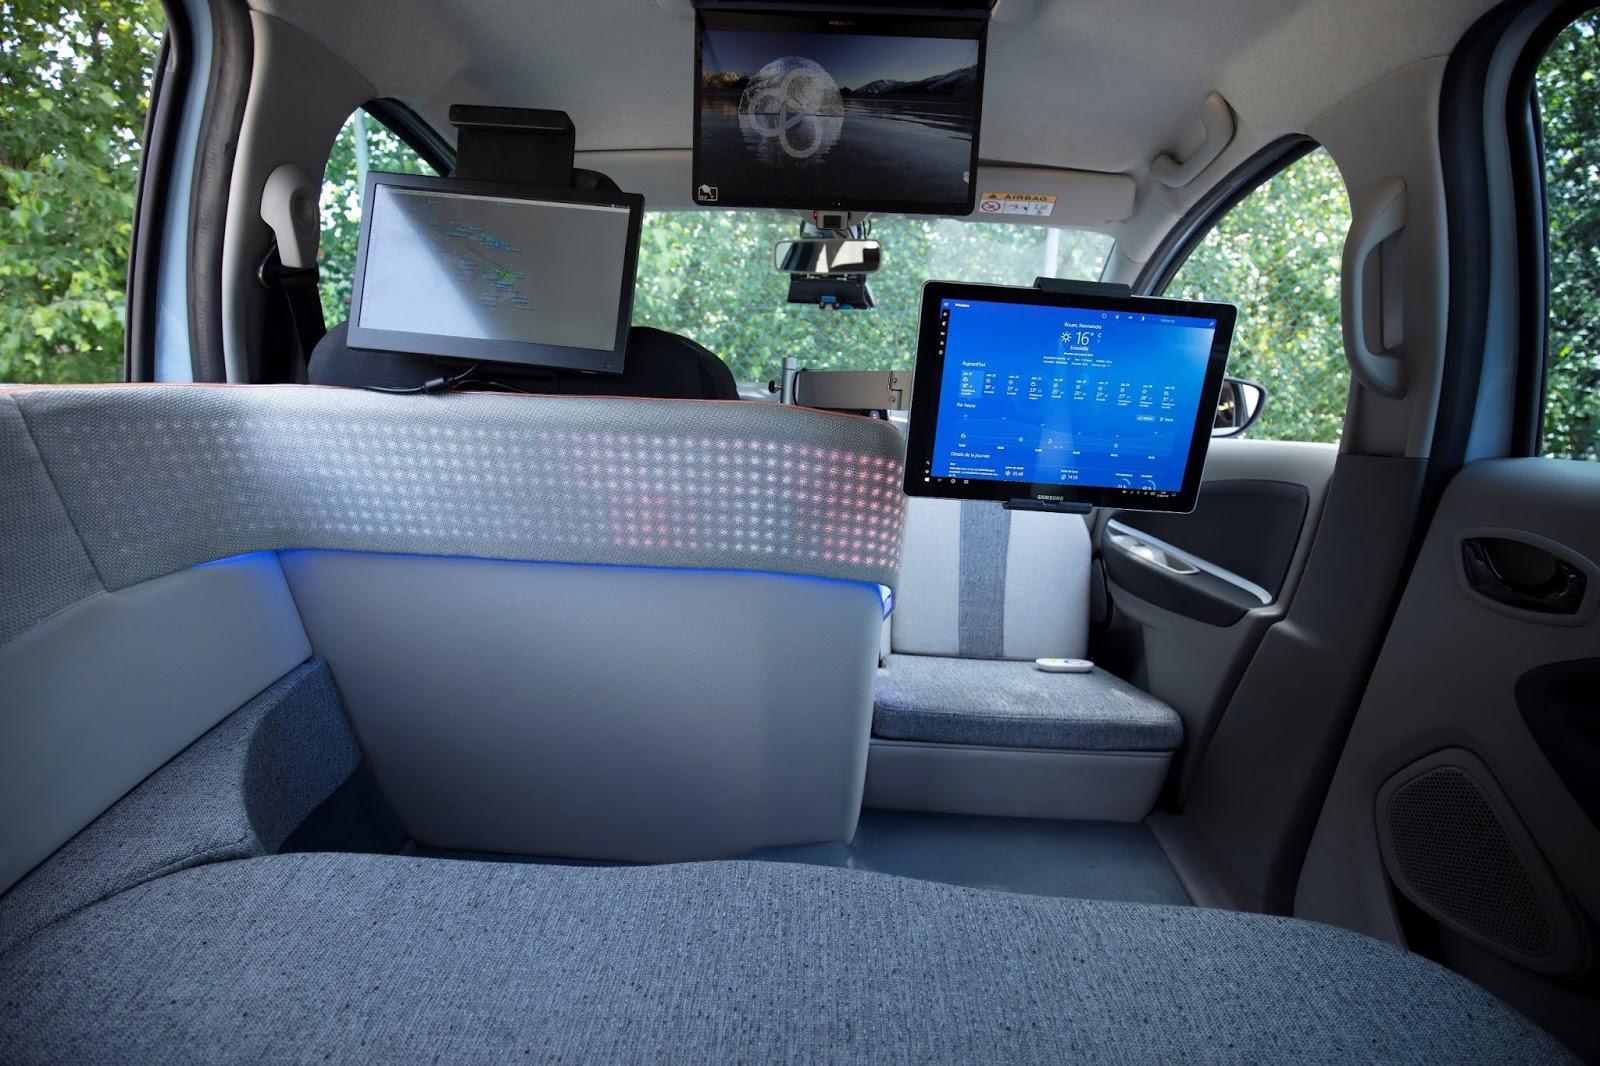 Renault2BZOE2B 2Bautonomy2B252842529 Έρχονται τα αυτόνομα οχήματα της Renault Autonomous Driving, Renault, video, videos, zblog, αυτόνομα, Αυτόνομη οδήγηση, βίντεο